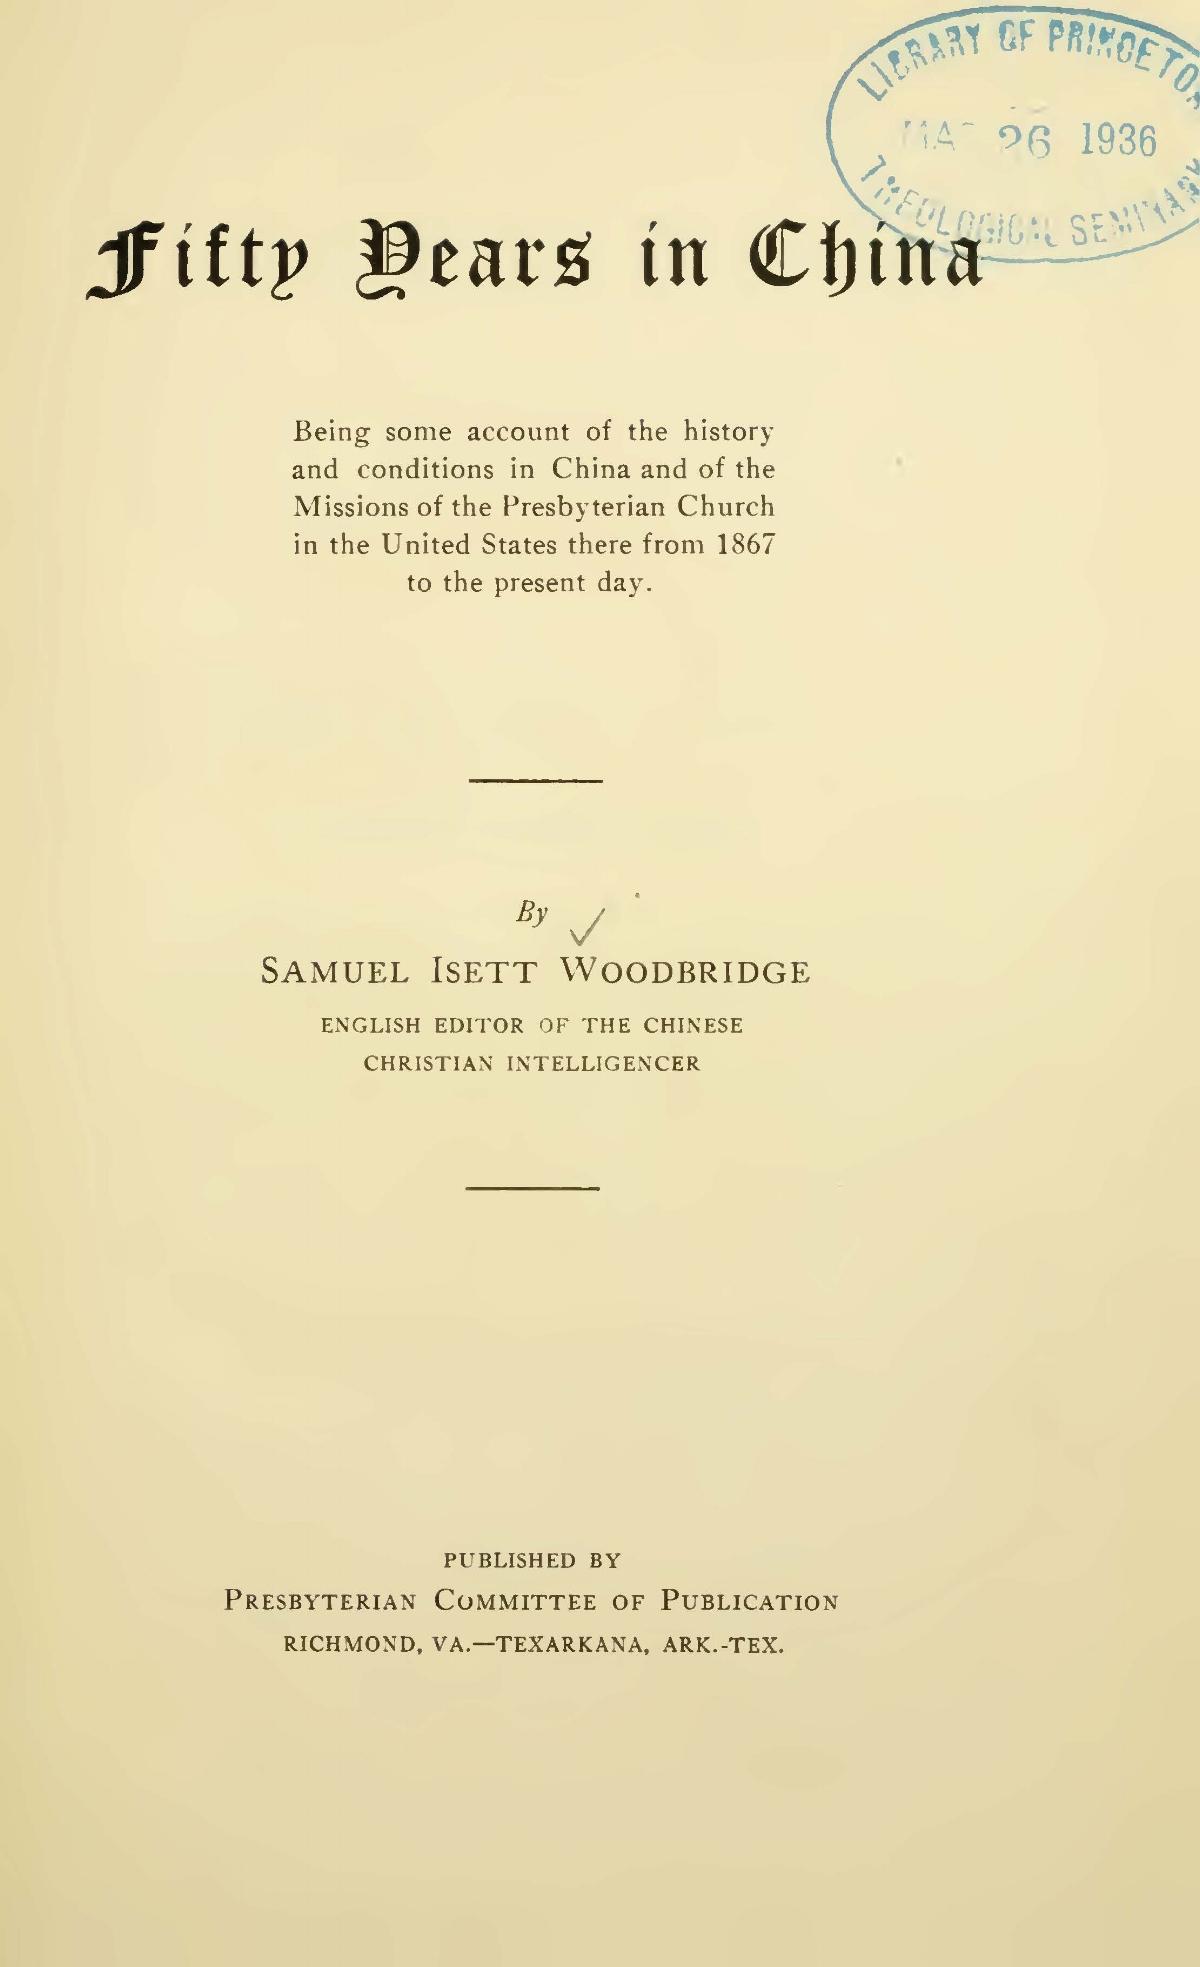 Woodbridge, Samuel Isett, Sr., Fifty Years in China Title Page.jpg